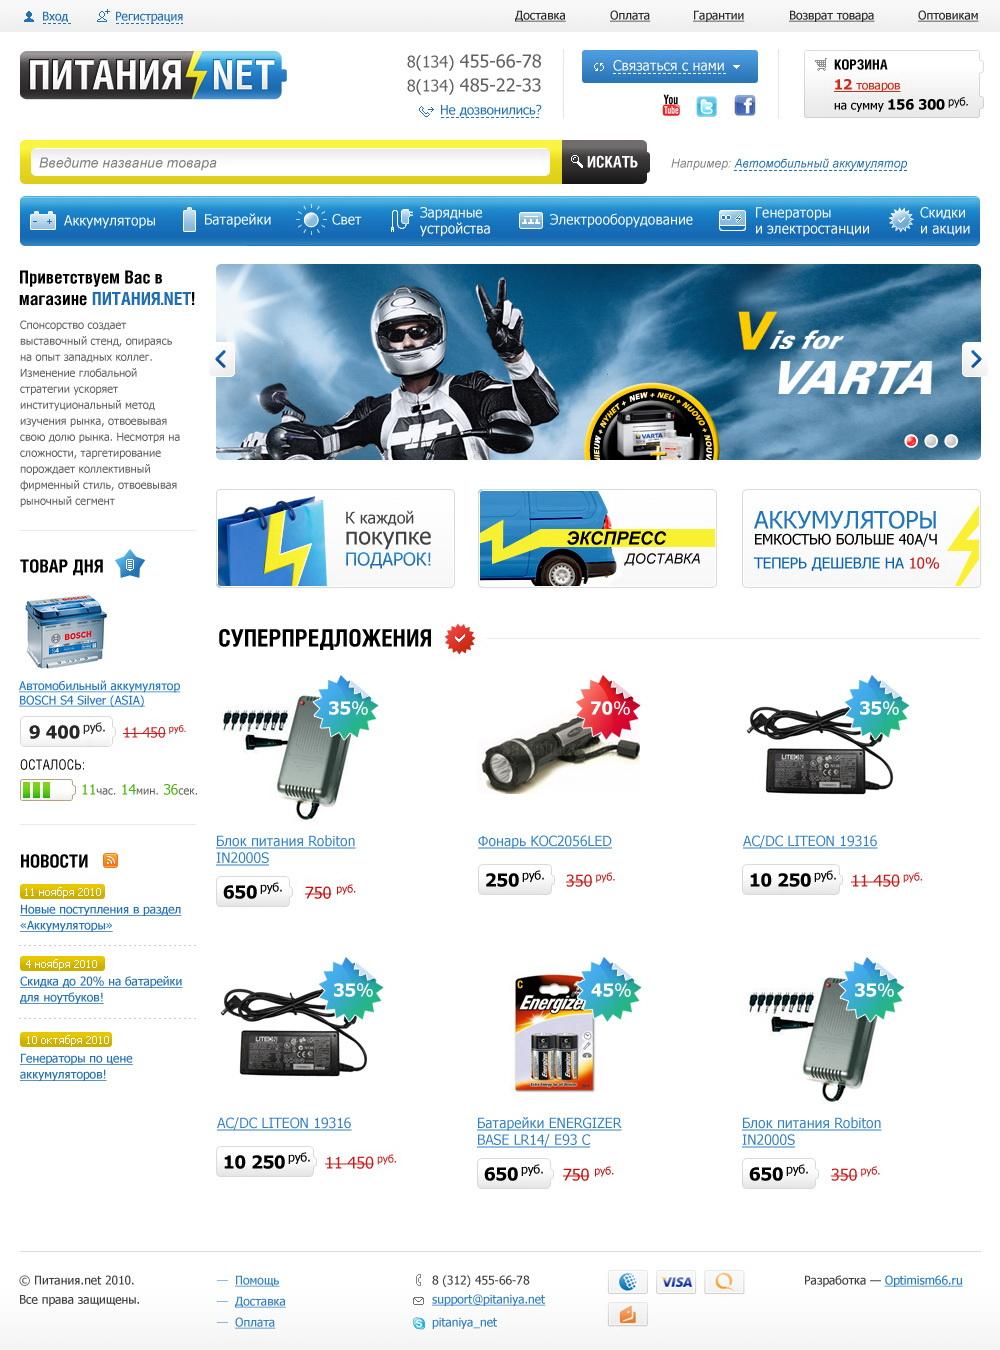 Интернет-магазин «ПИТАНИЯ.NET»